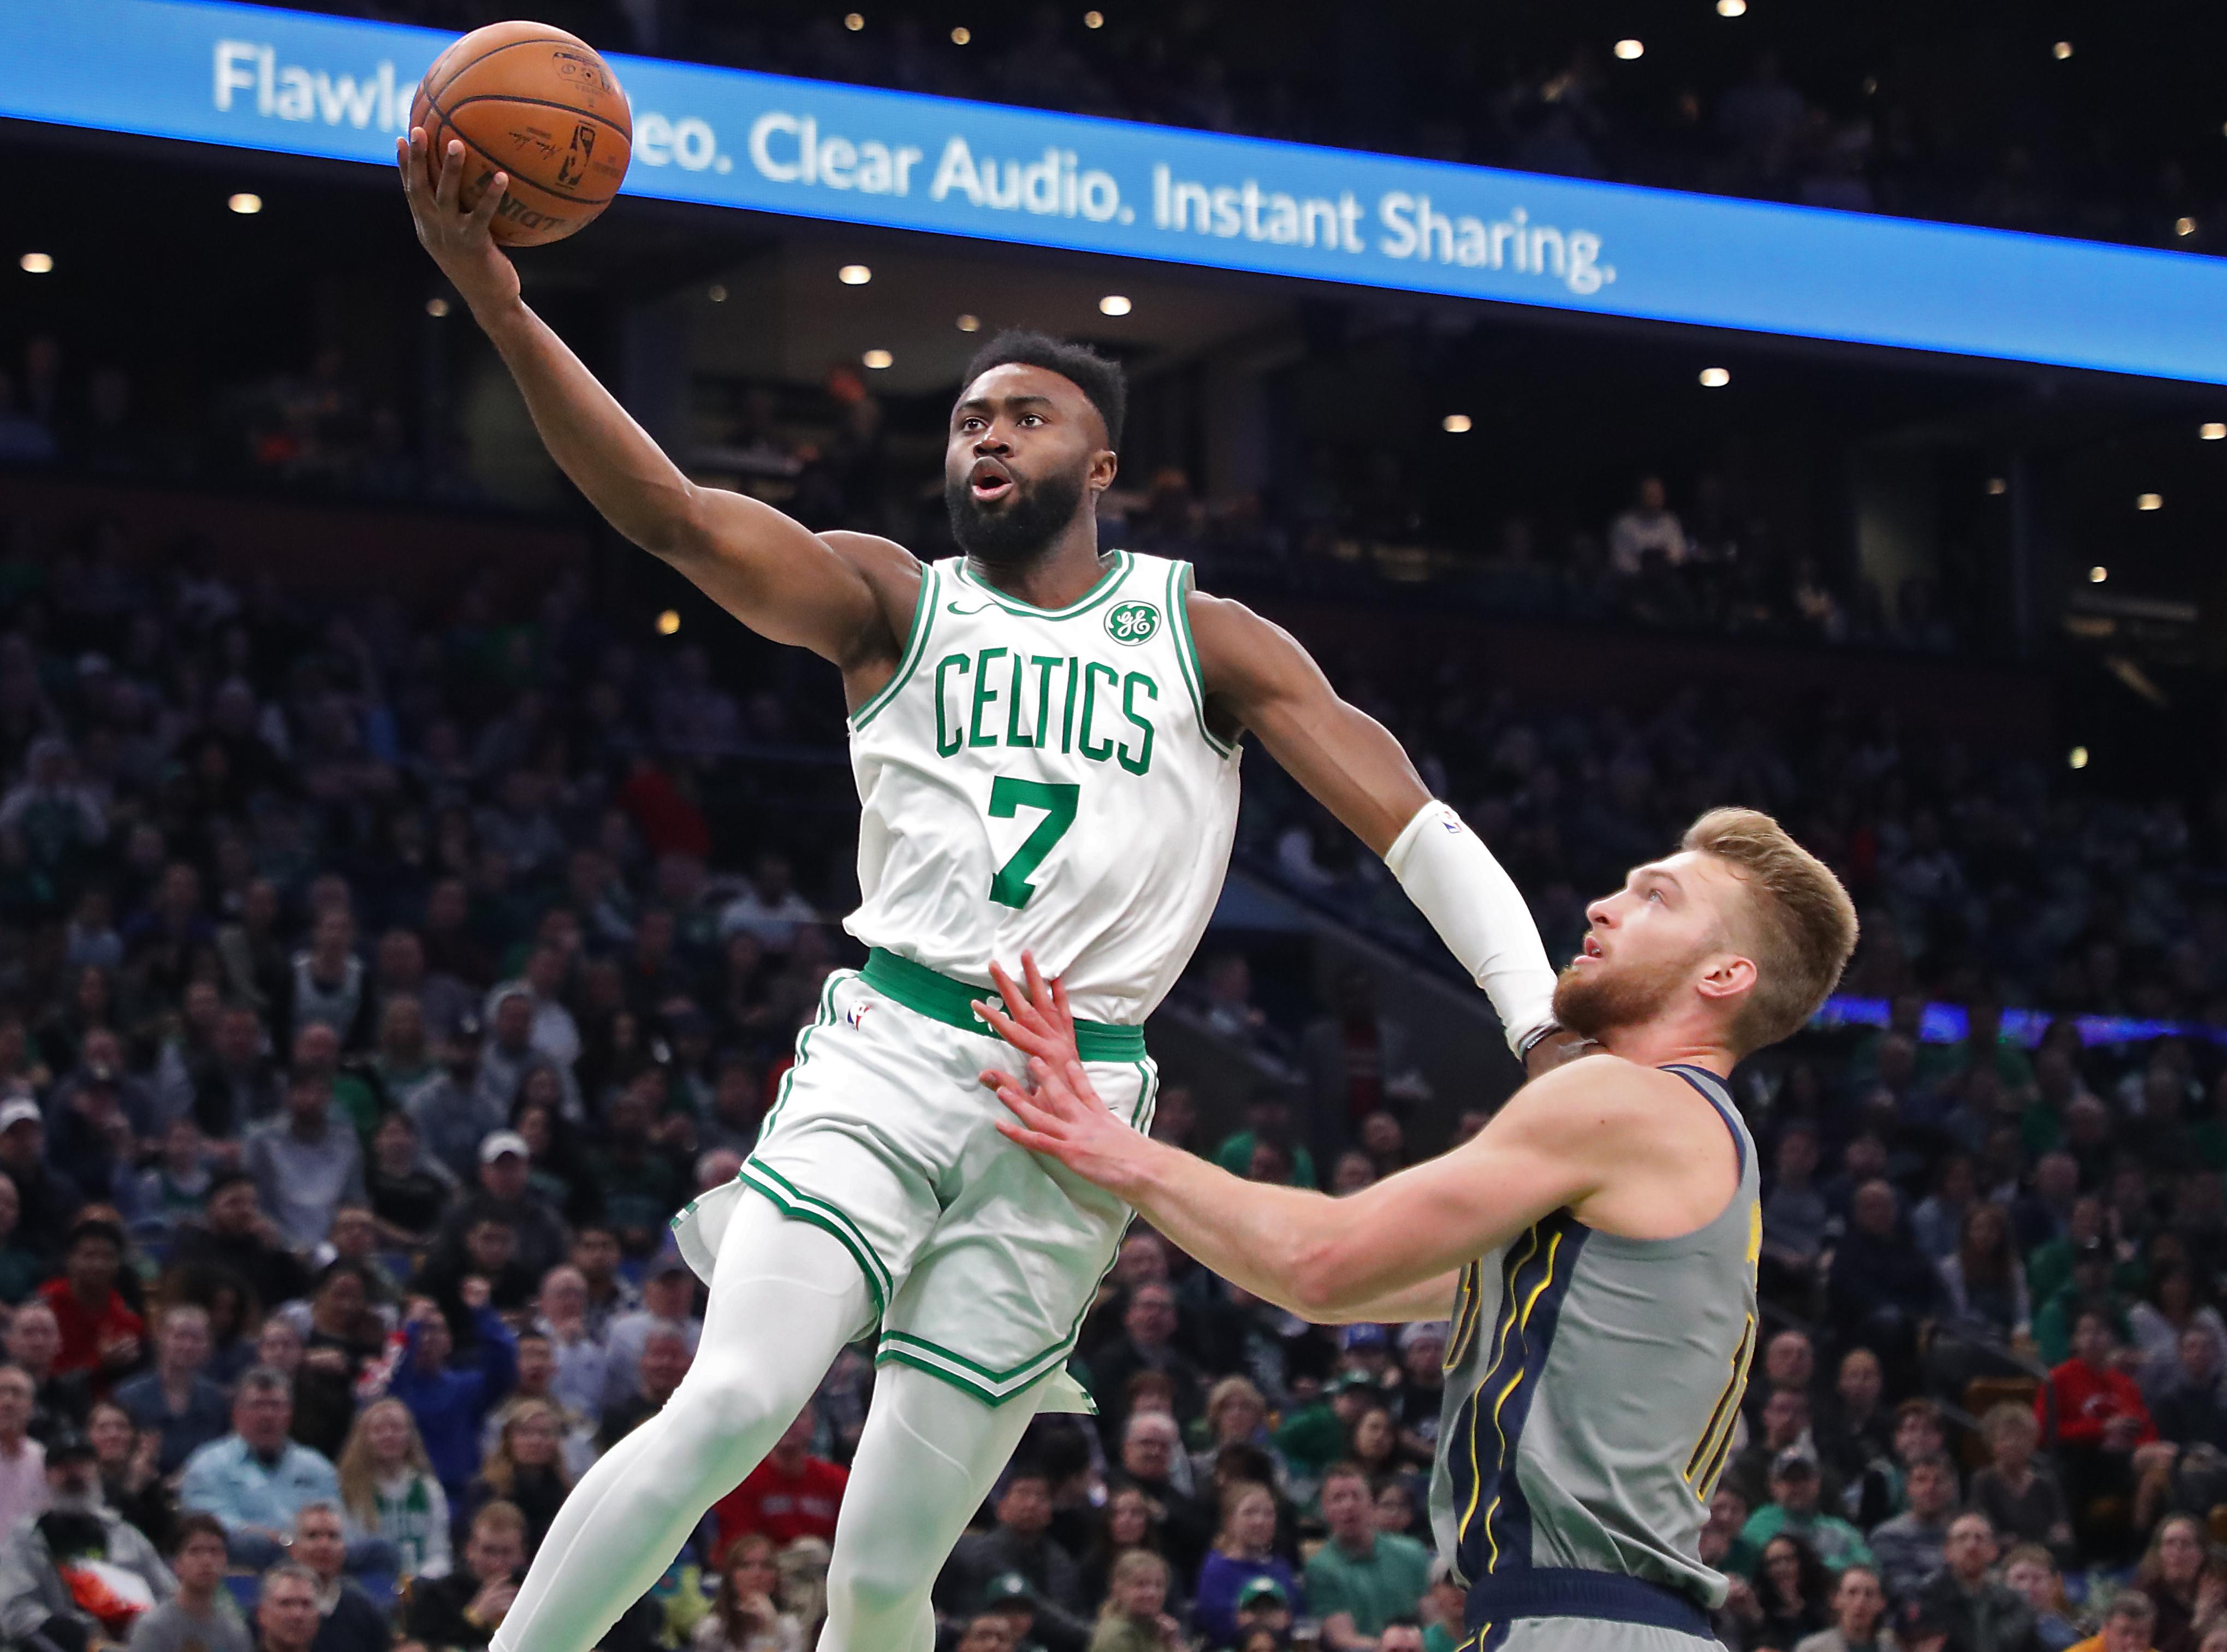 Indiana Pacers Vs Boston Celtics At TD Garden